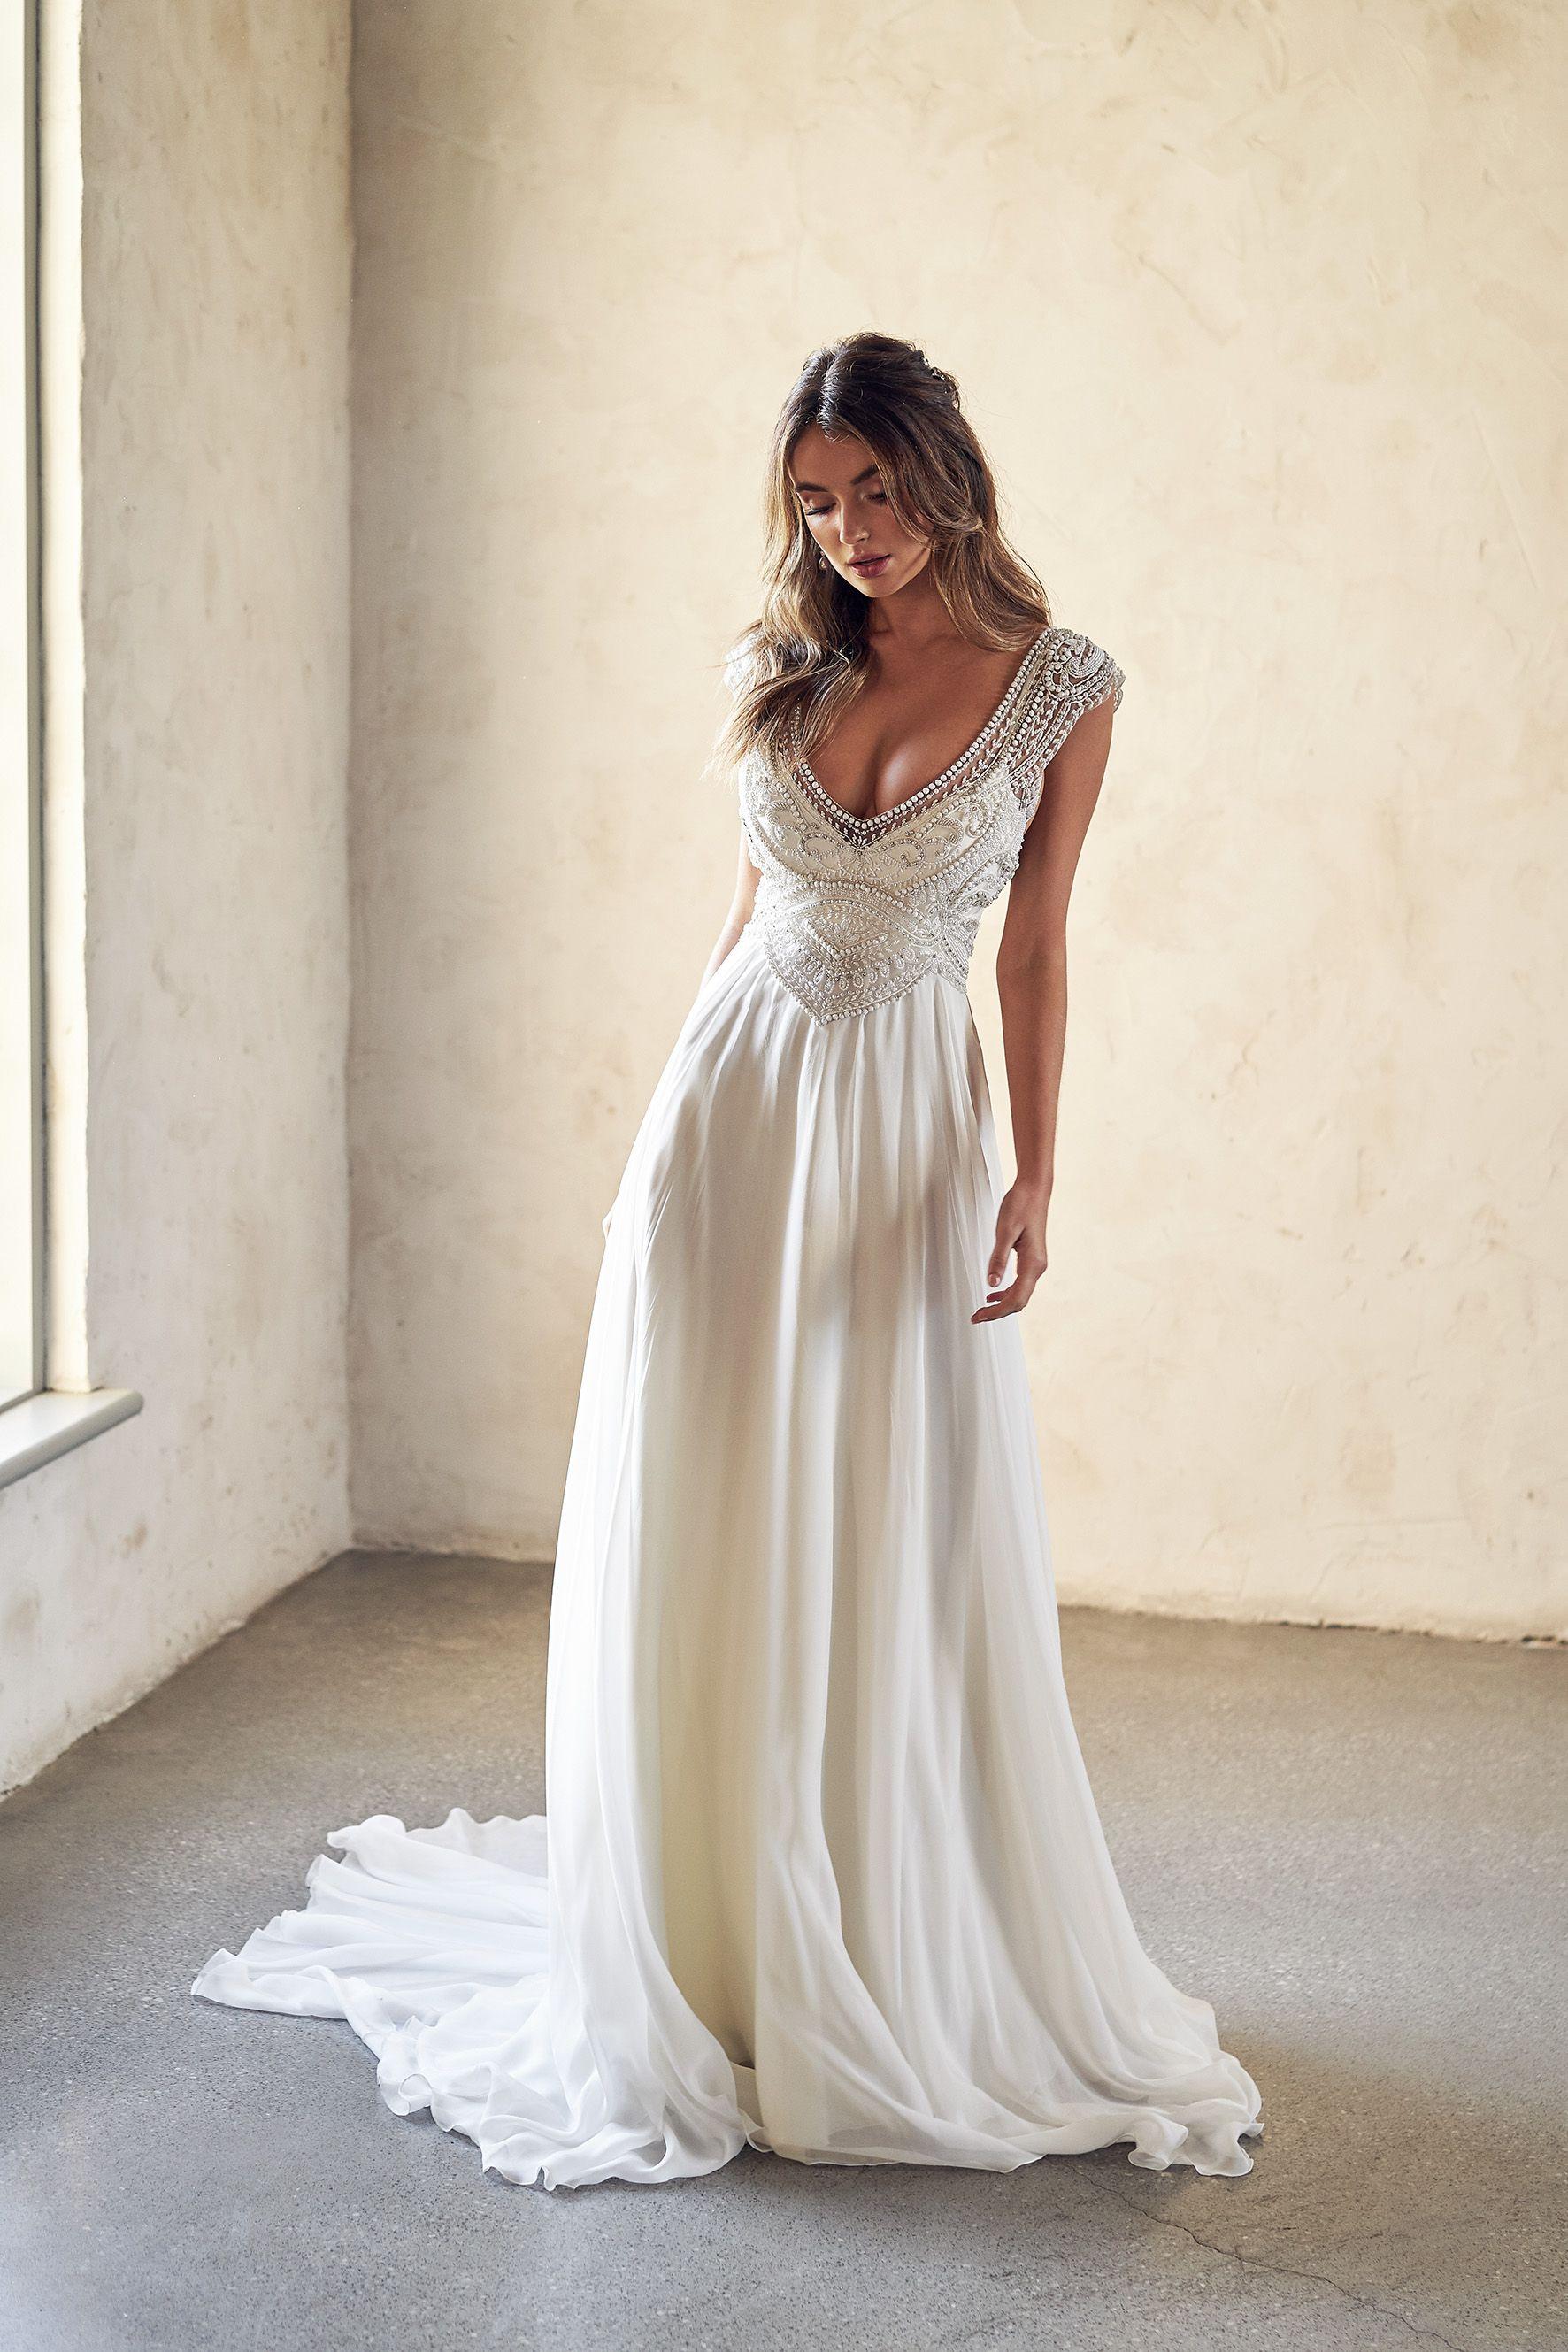 Sorrento Summer in 2020 Wedding dresses, Bohemian